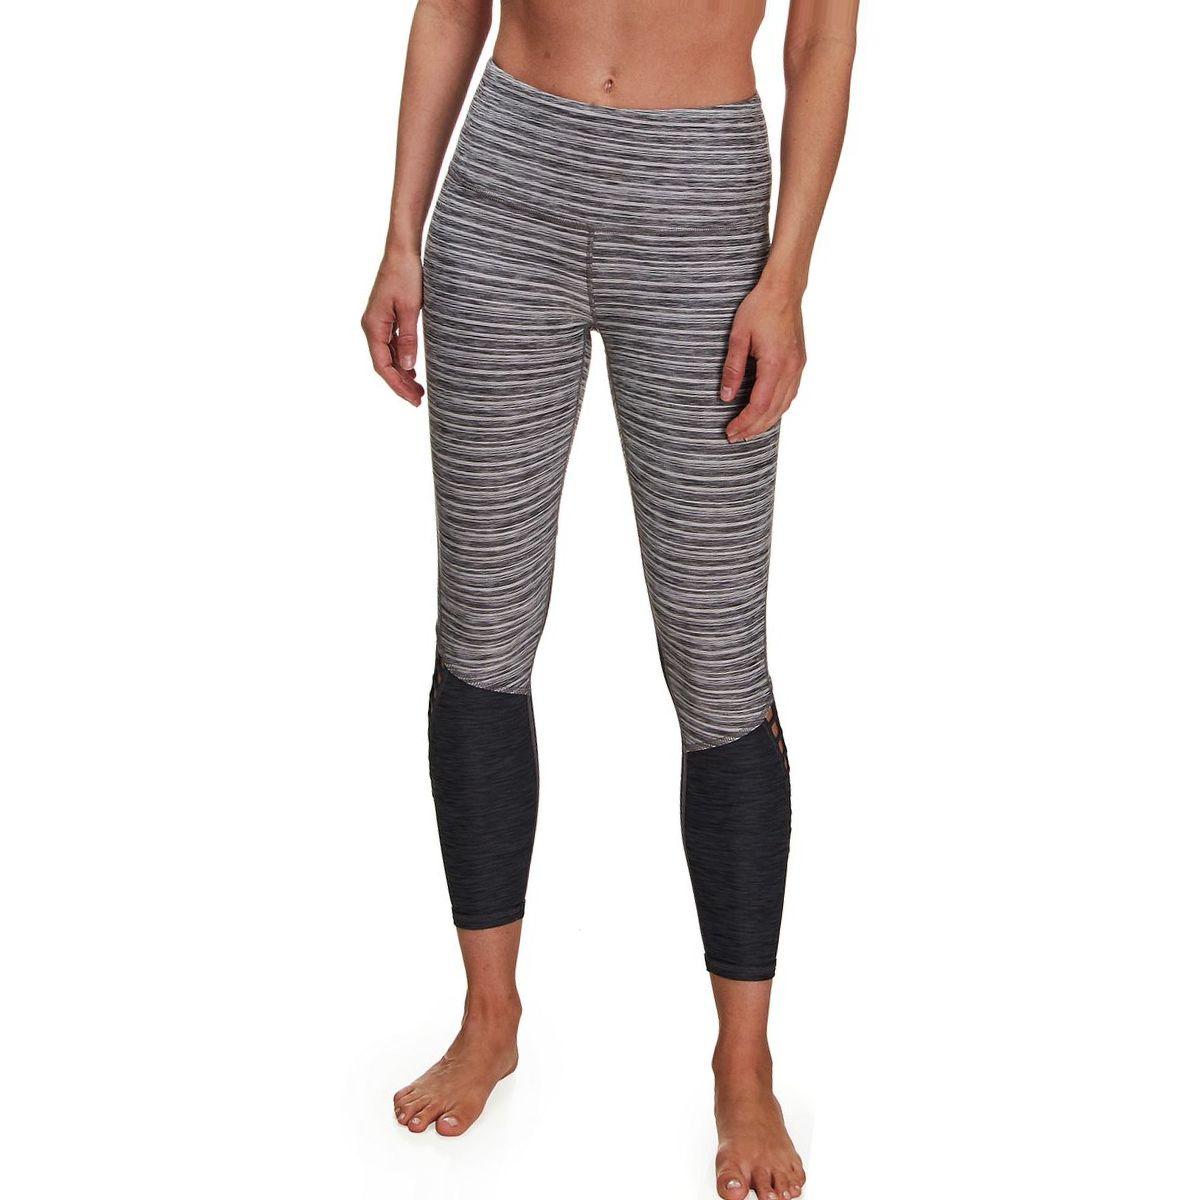 Prana Bohemio 7/8 Legging - Women's